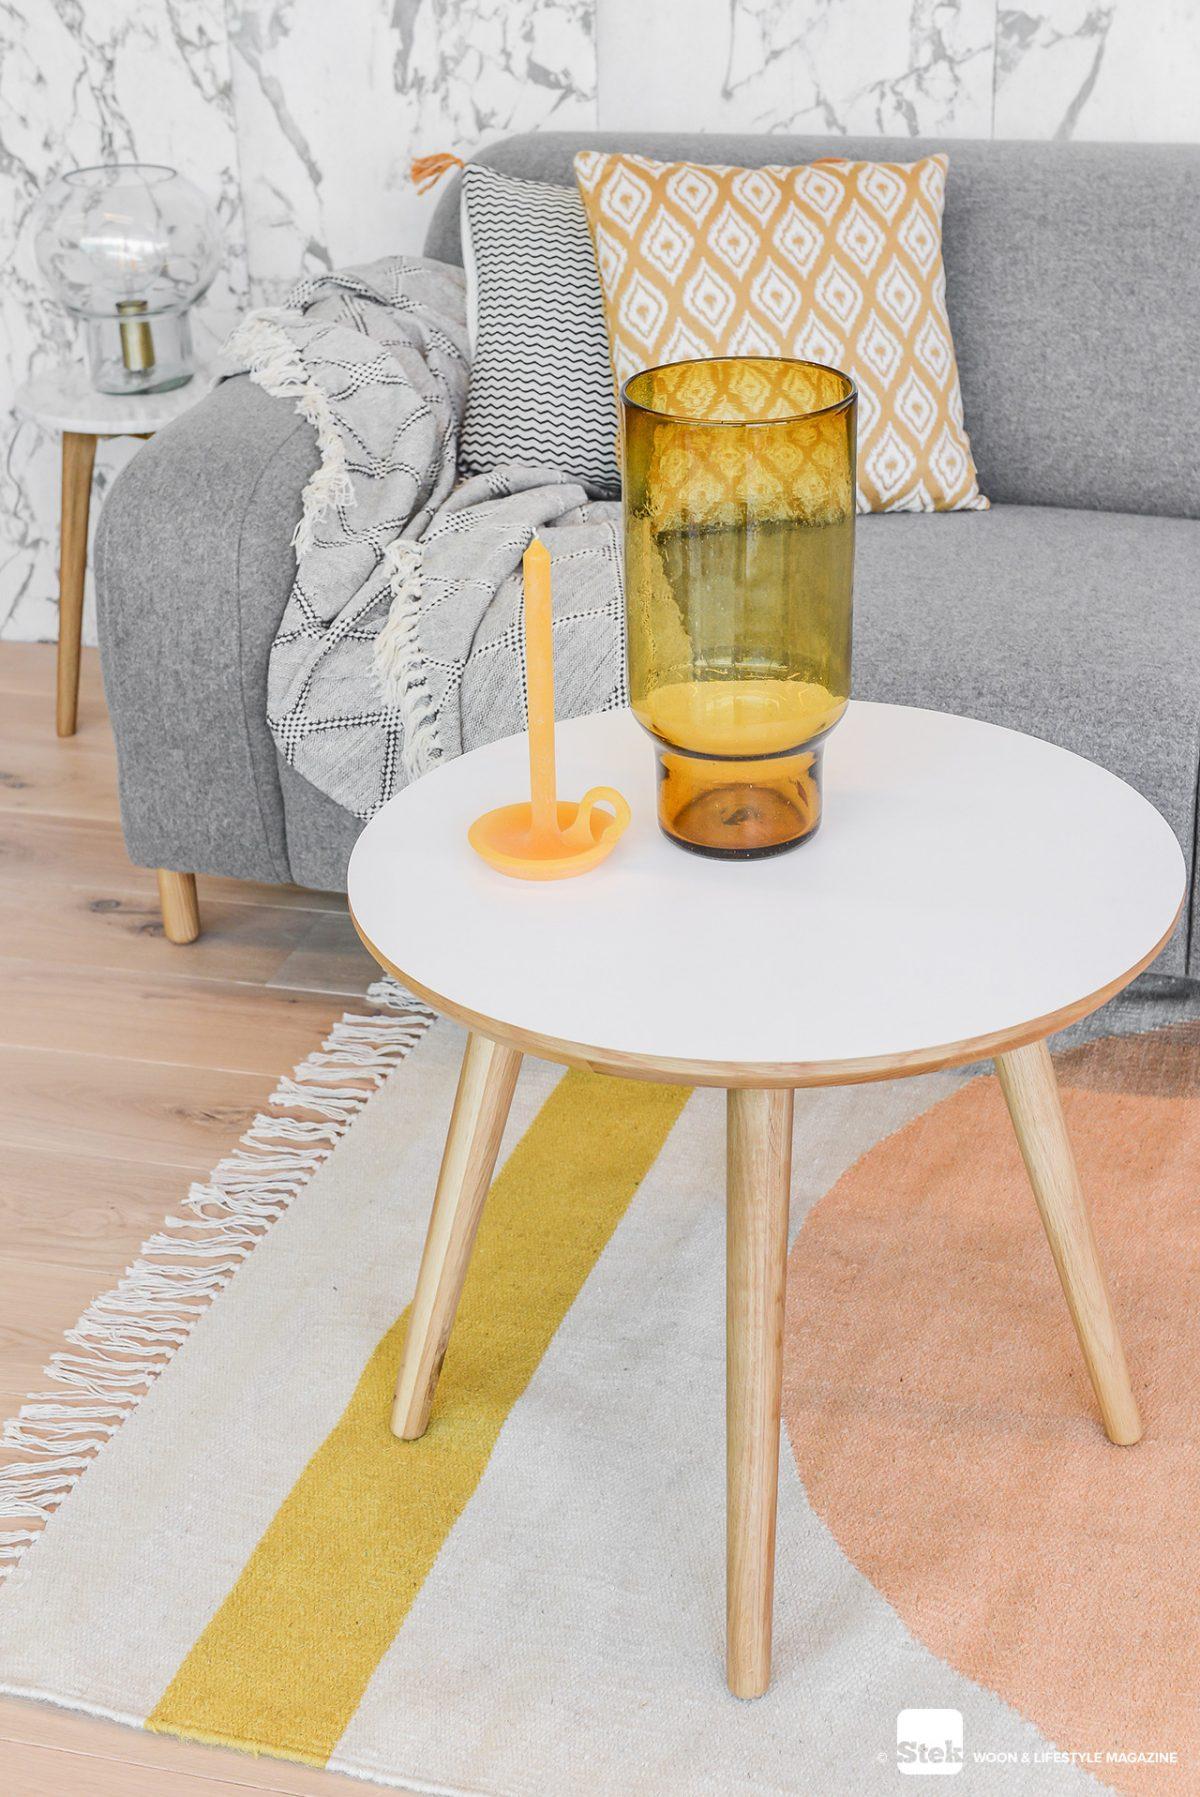 Stek Oker Cantel vase  Van Eijk Van der Lubbe Imperfect design – gimmii